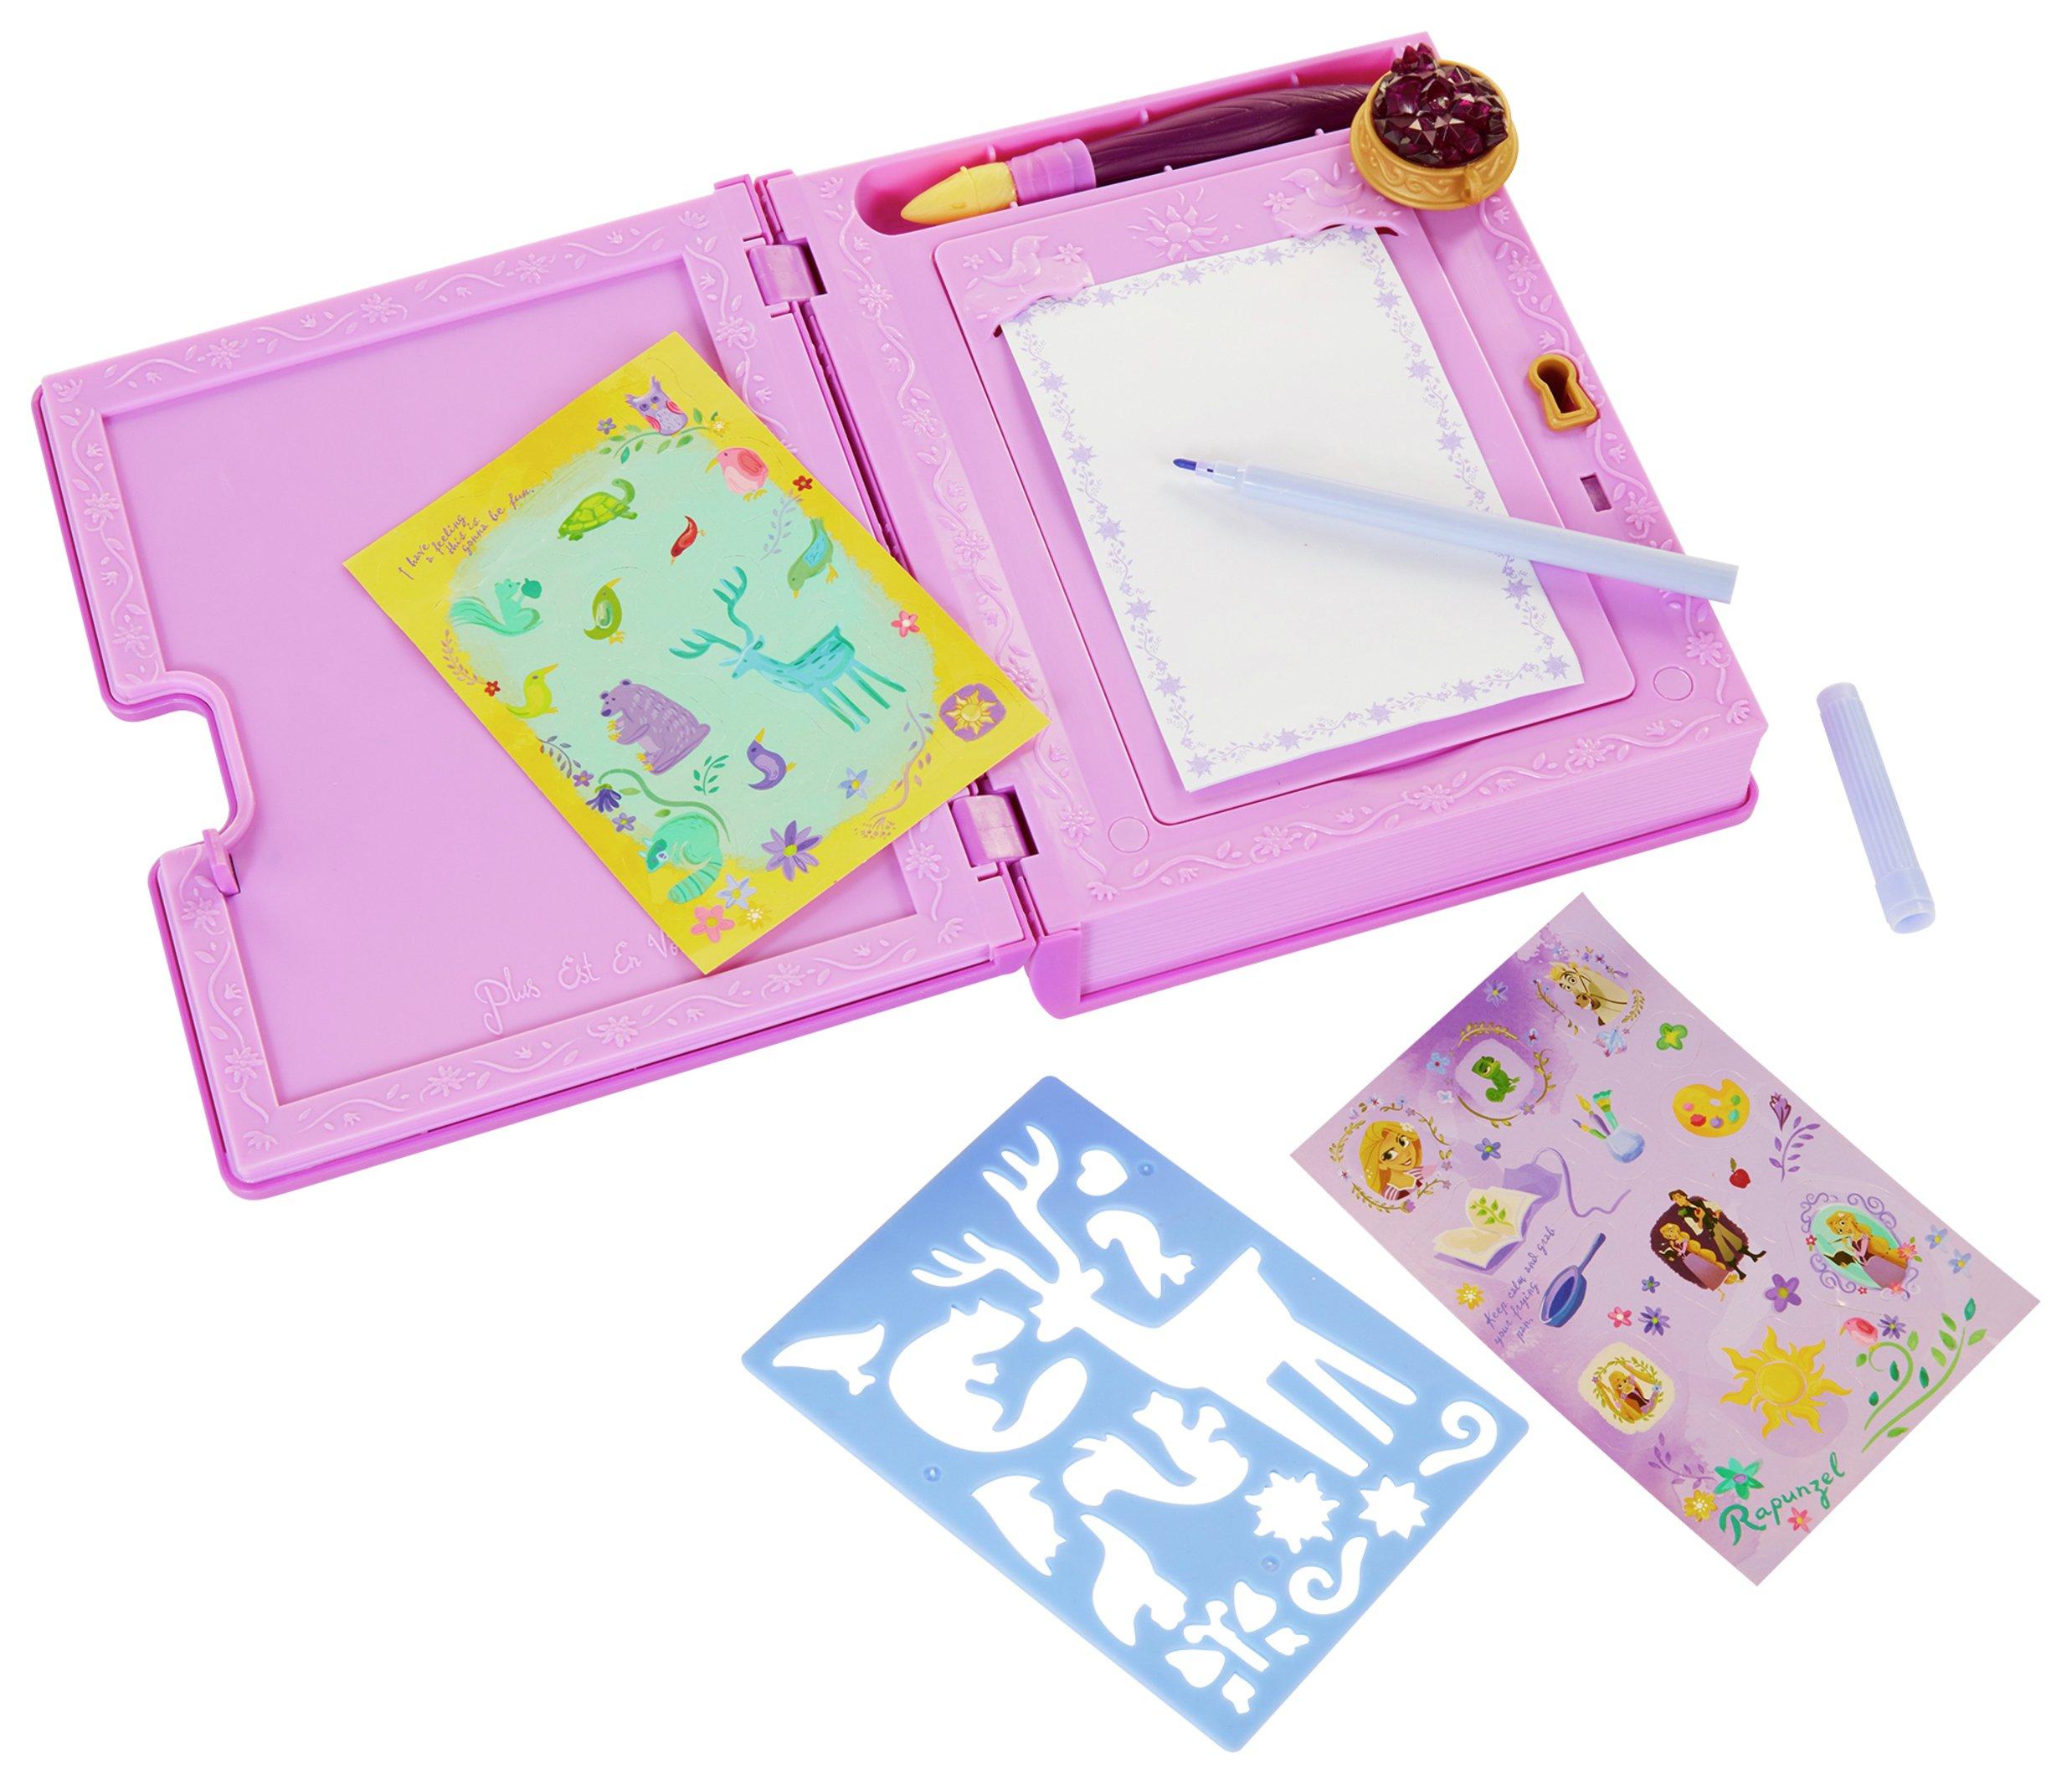 Disney Princess Tangled Rapunzel's Secret Journal